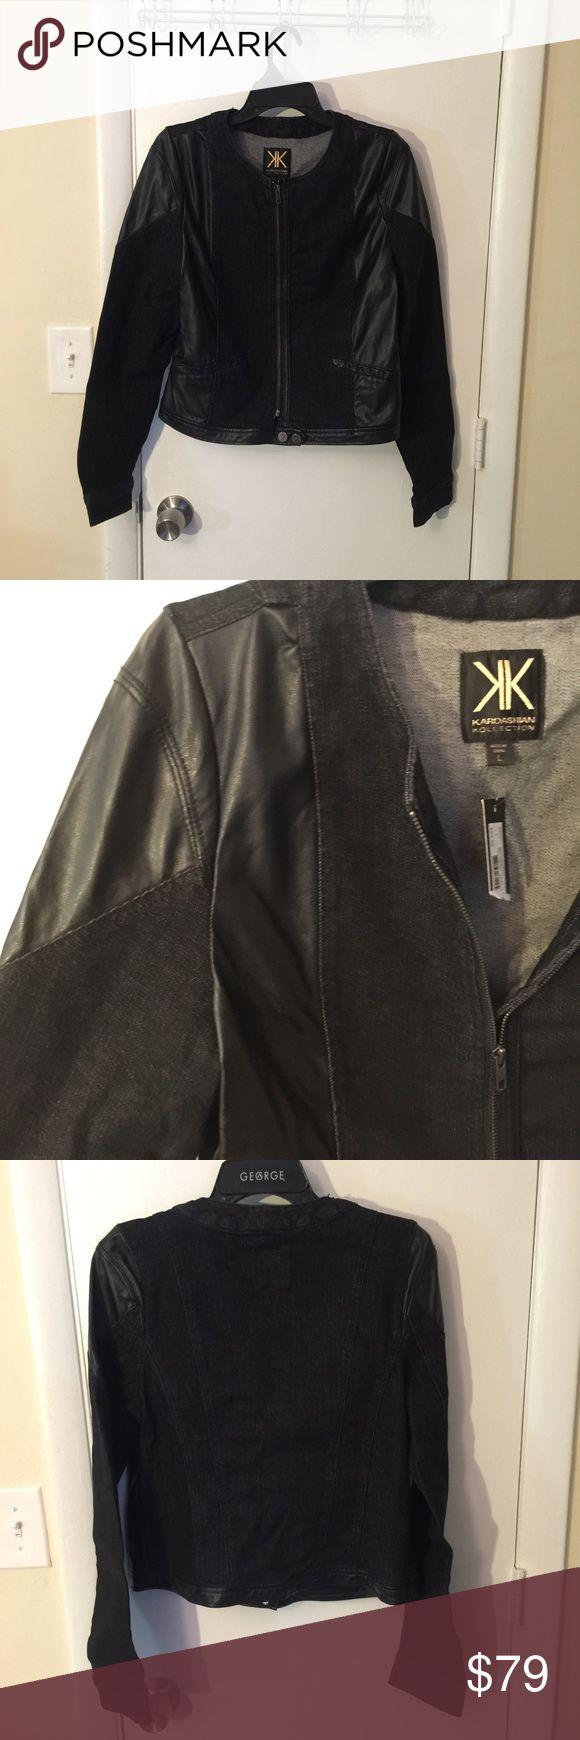 Kardashian Kollection Moto jacket Black denim & vegan leather Moto jacket from kardashian Kollection. Size xl. New with tags. Kardashian Kollection Jackets & Coats Utility Jackets